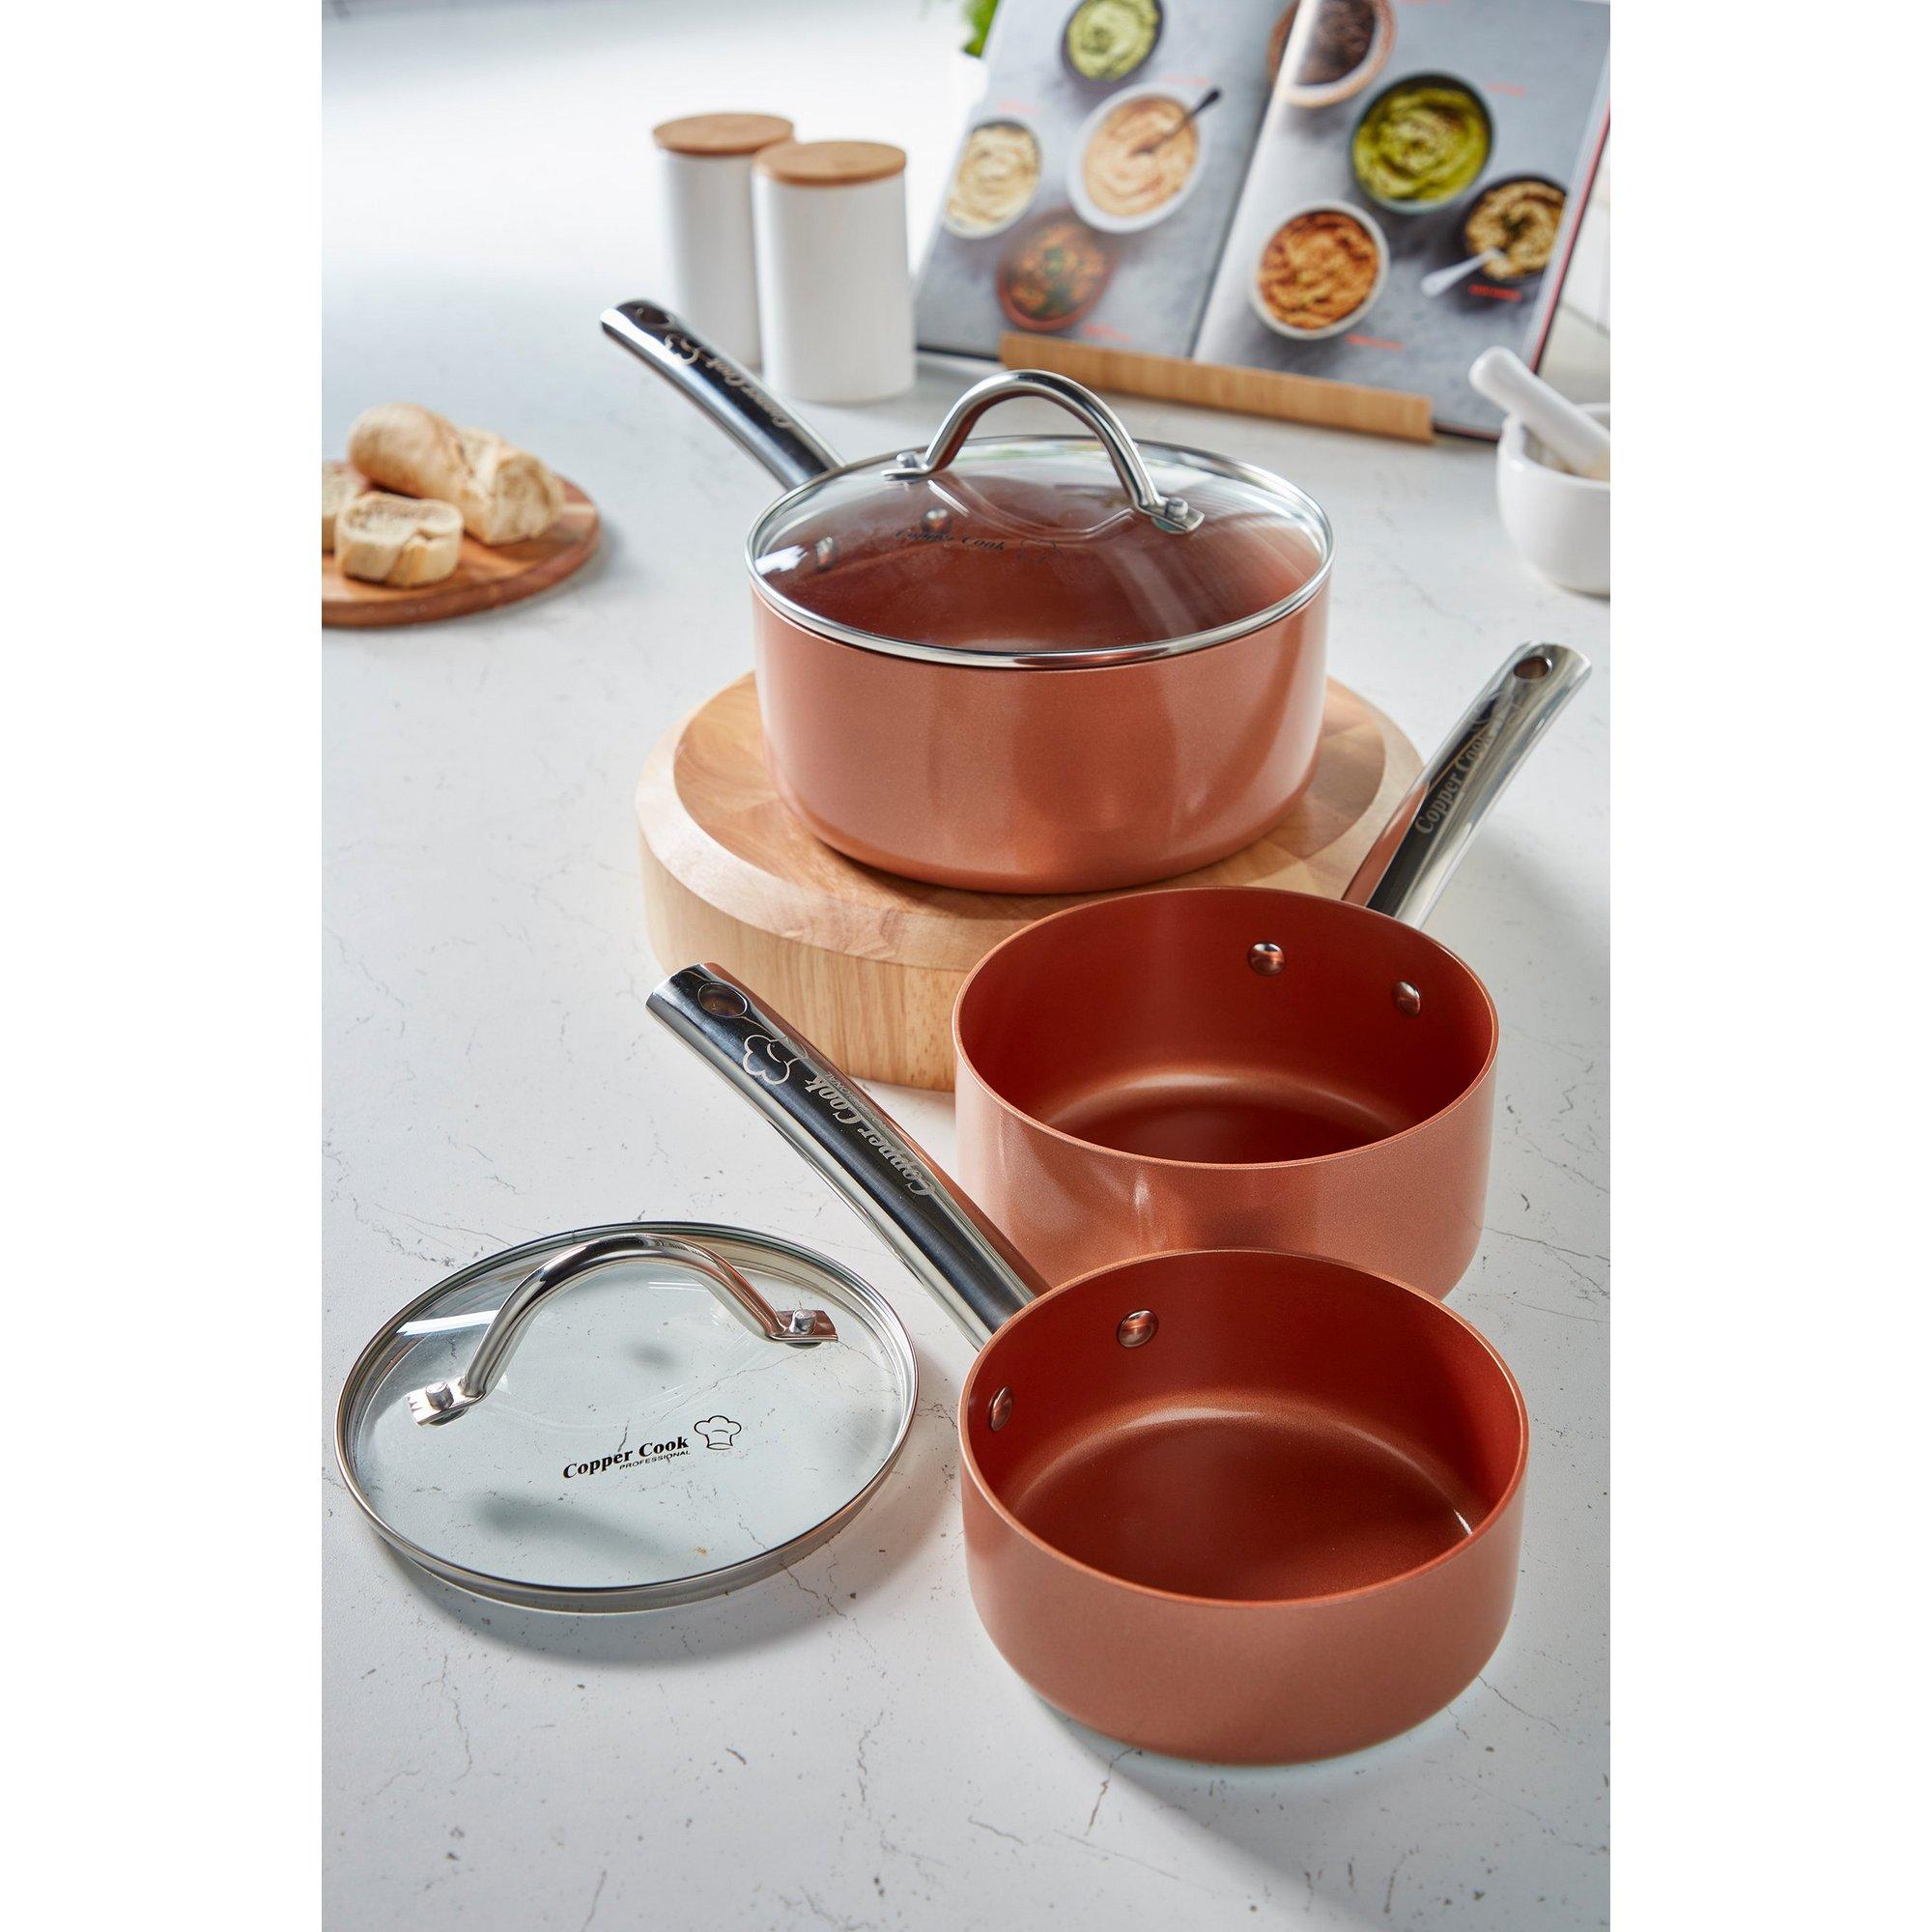 Image of Copper Cook 3-Piece Saucepan Set